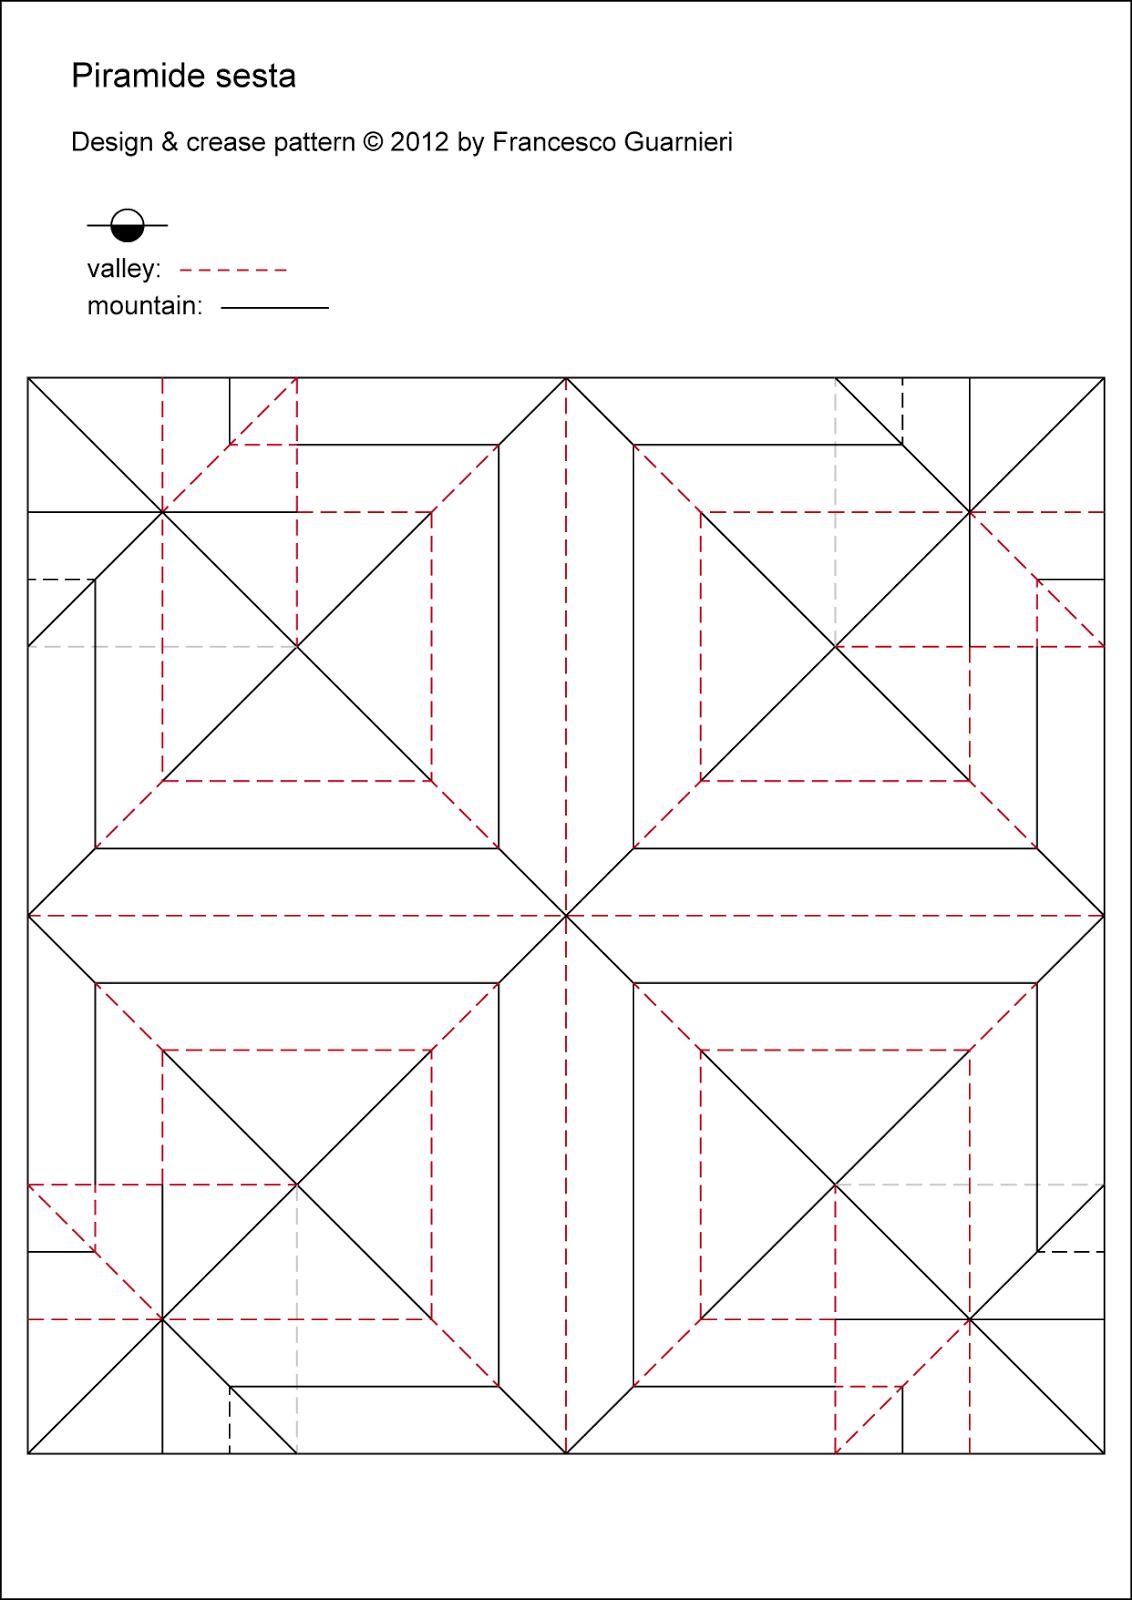 Origami CP Piramide sesta - Sixth pyramid by Francesco Guarnieri